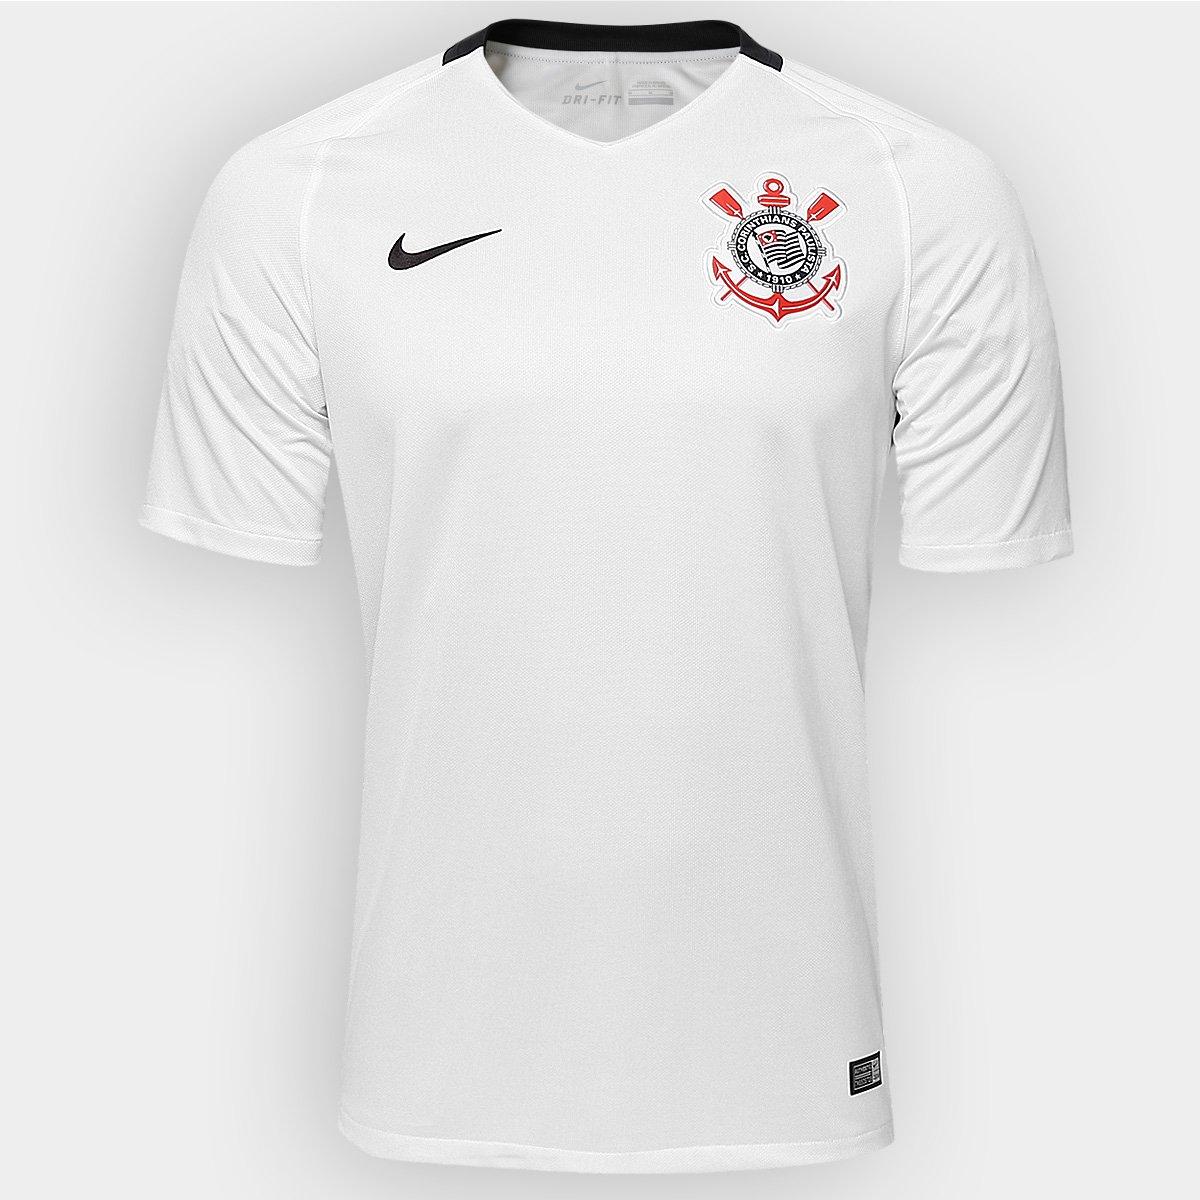 Camisa Corinthians I 2016 s nº Torcedor Nike Masculina - Compre ... a9c022f8e3805